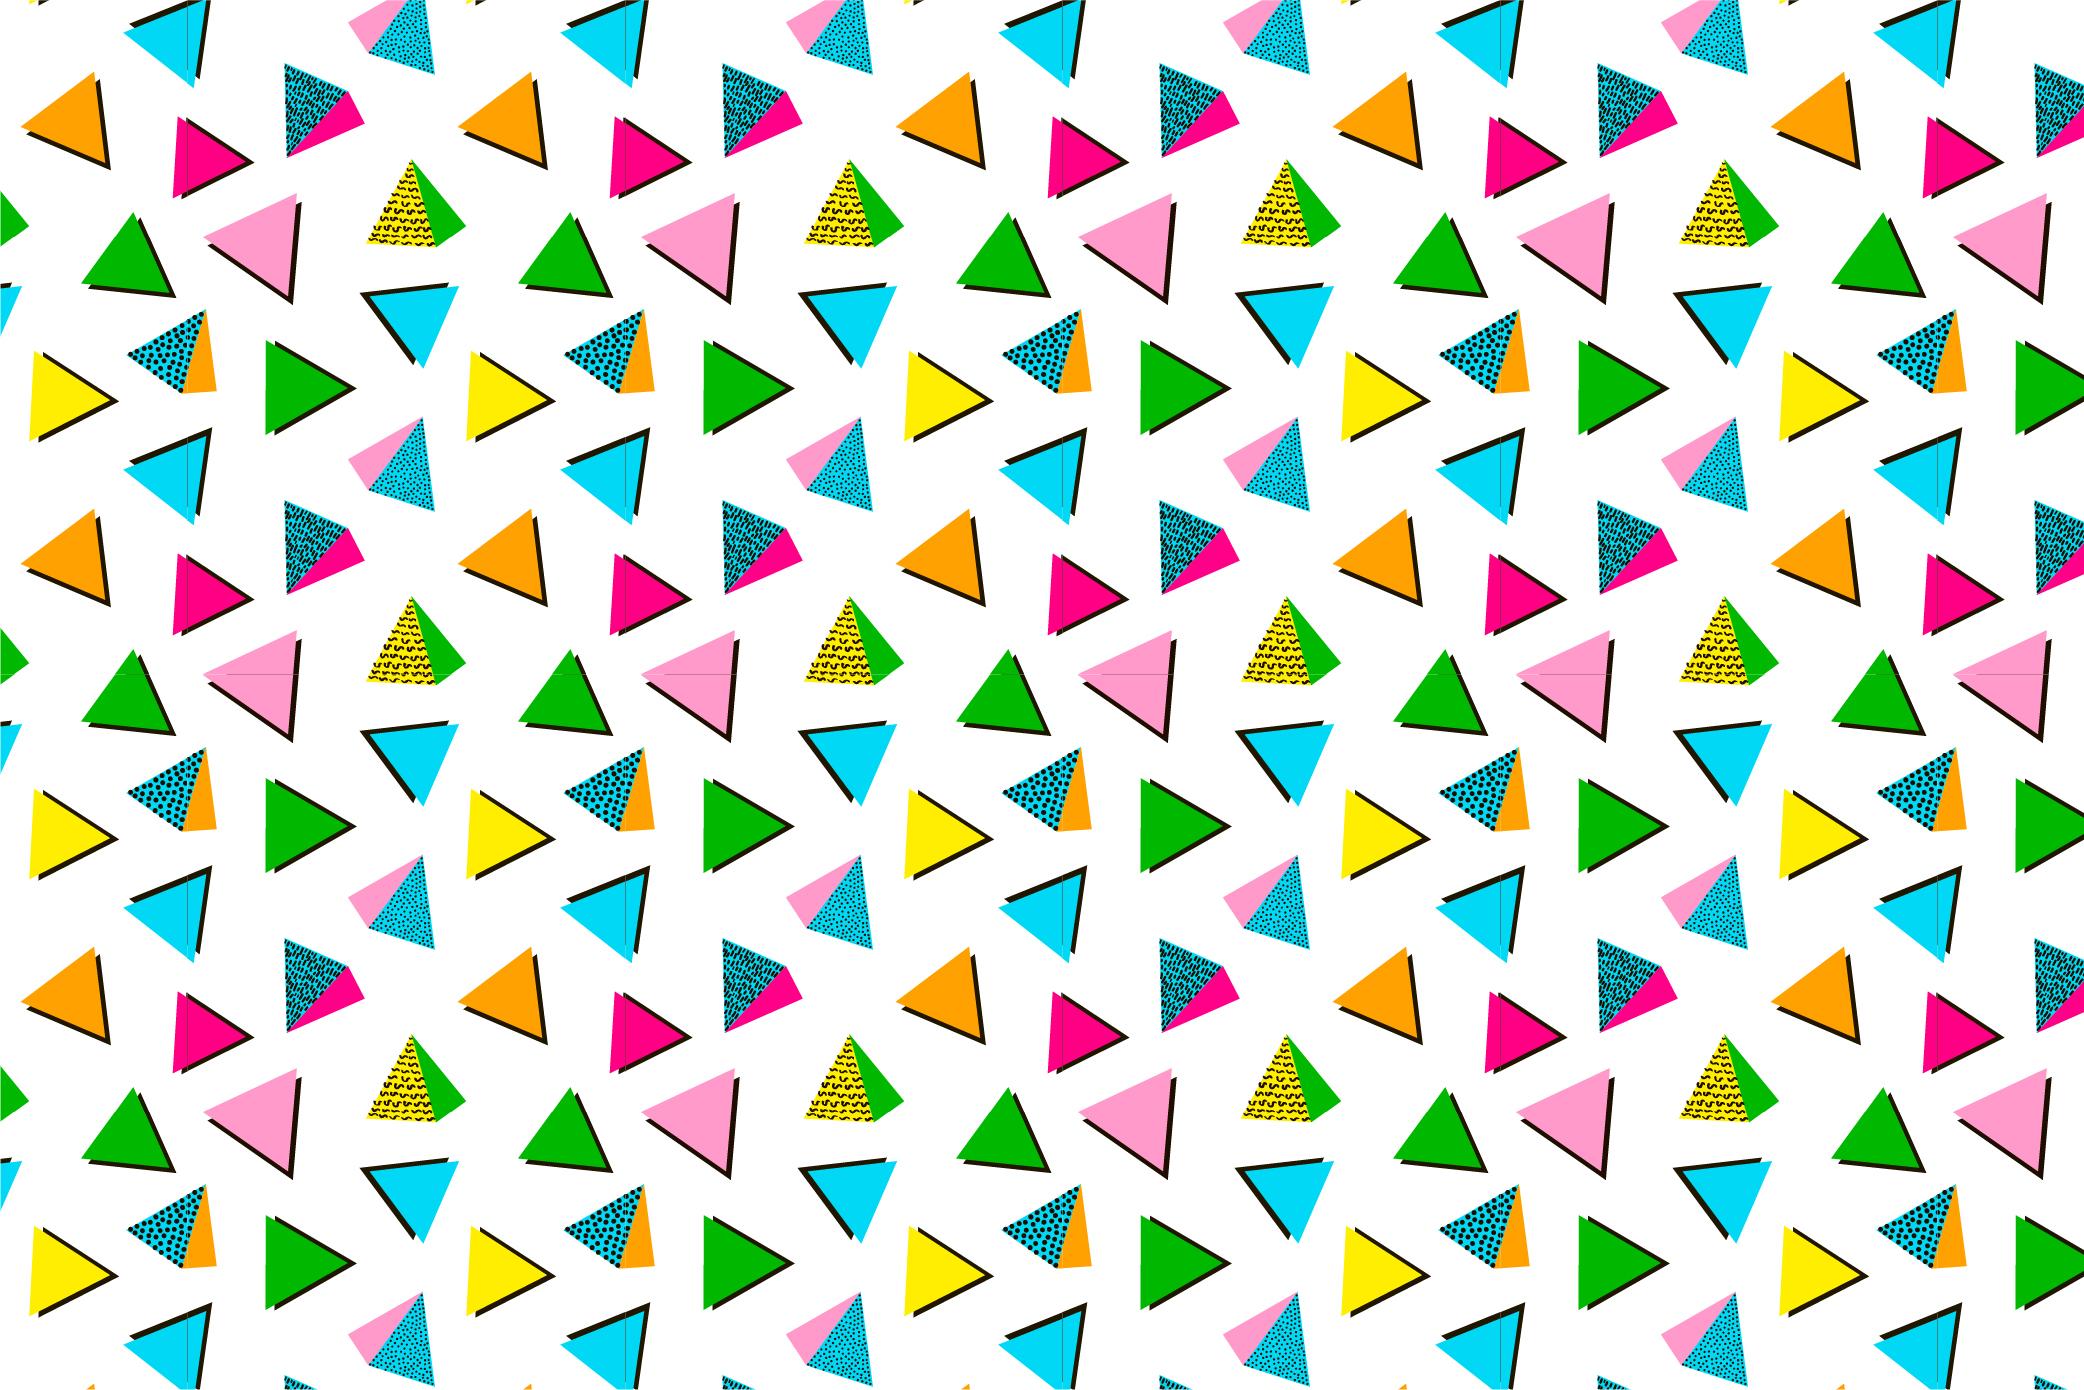 9 Geometric seamless patterns. Ai, EPS, JPG, SVG example image 8